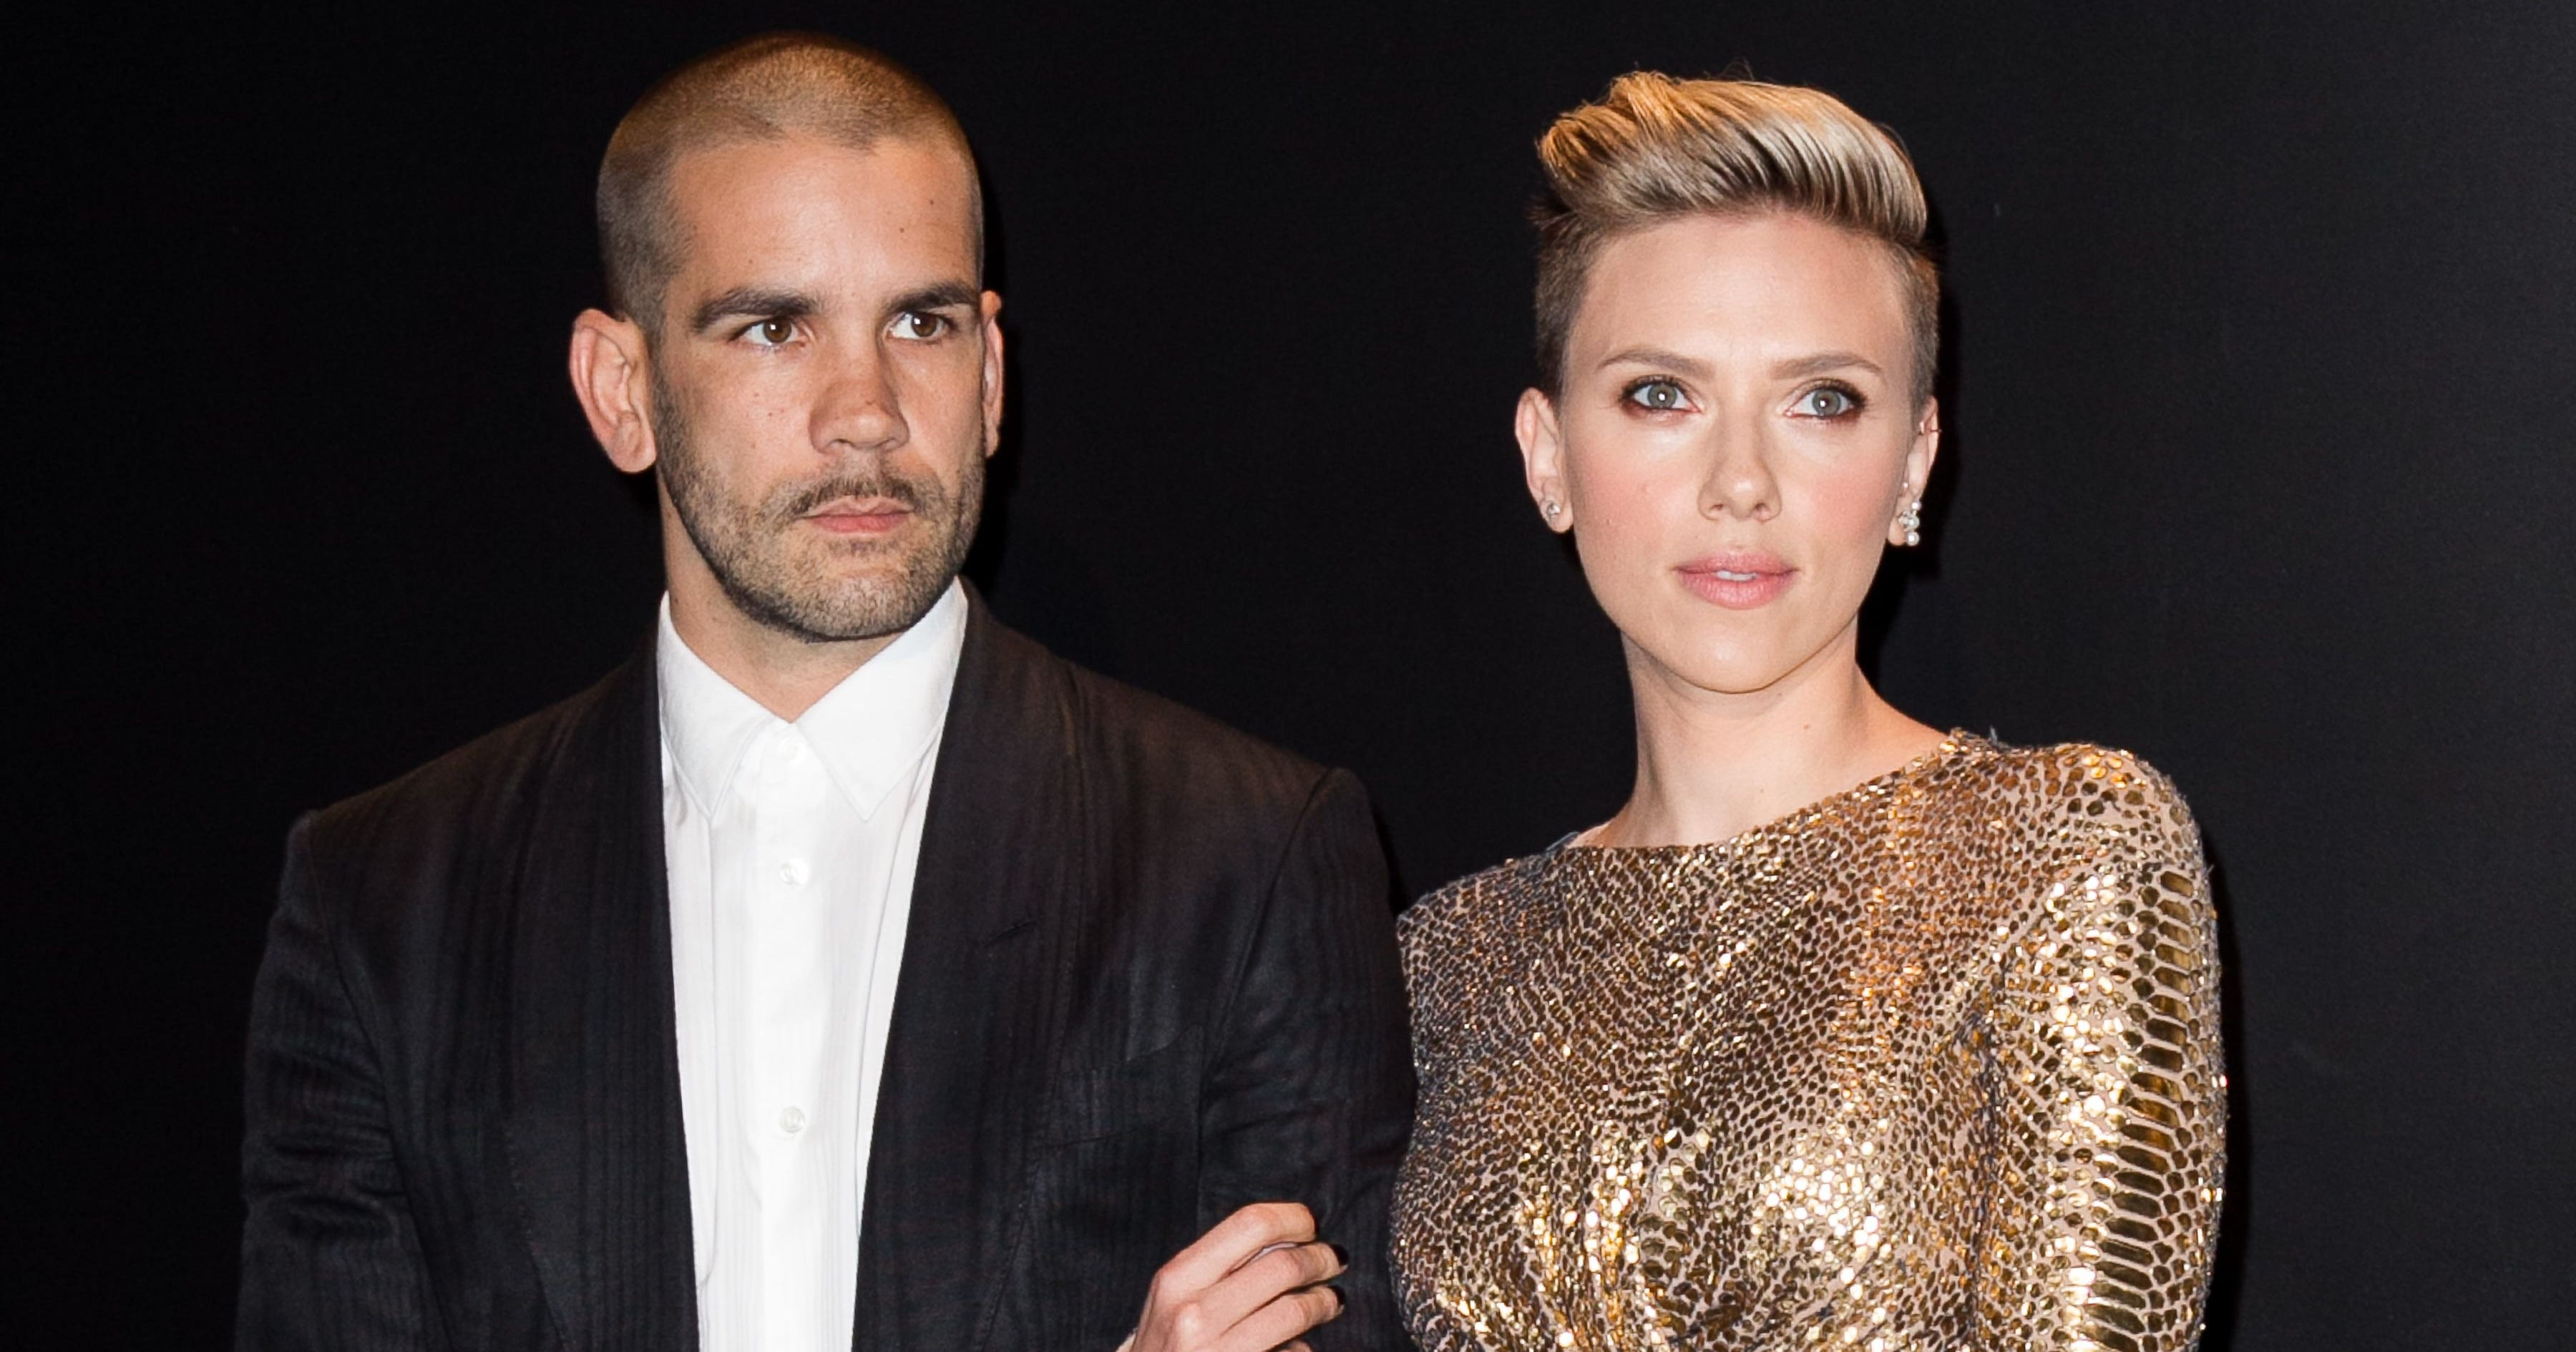 Scarlett Johansson Romain Dauriac Divorce